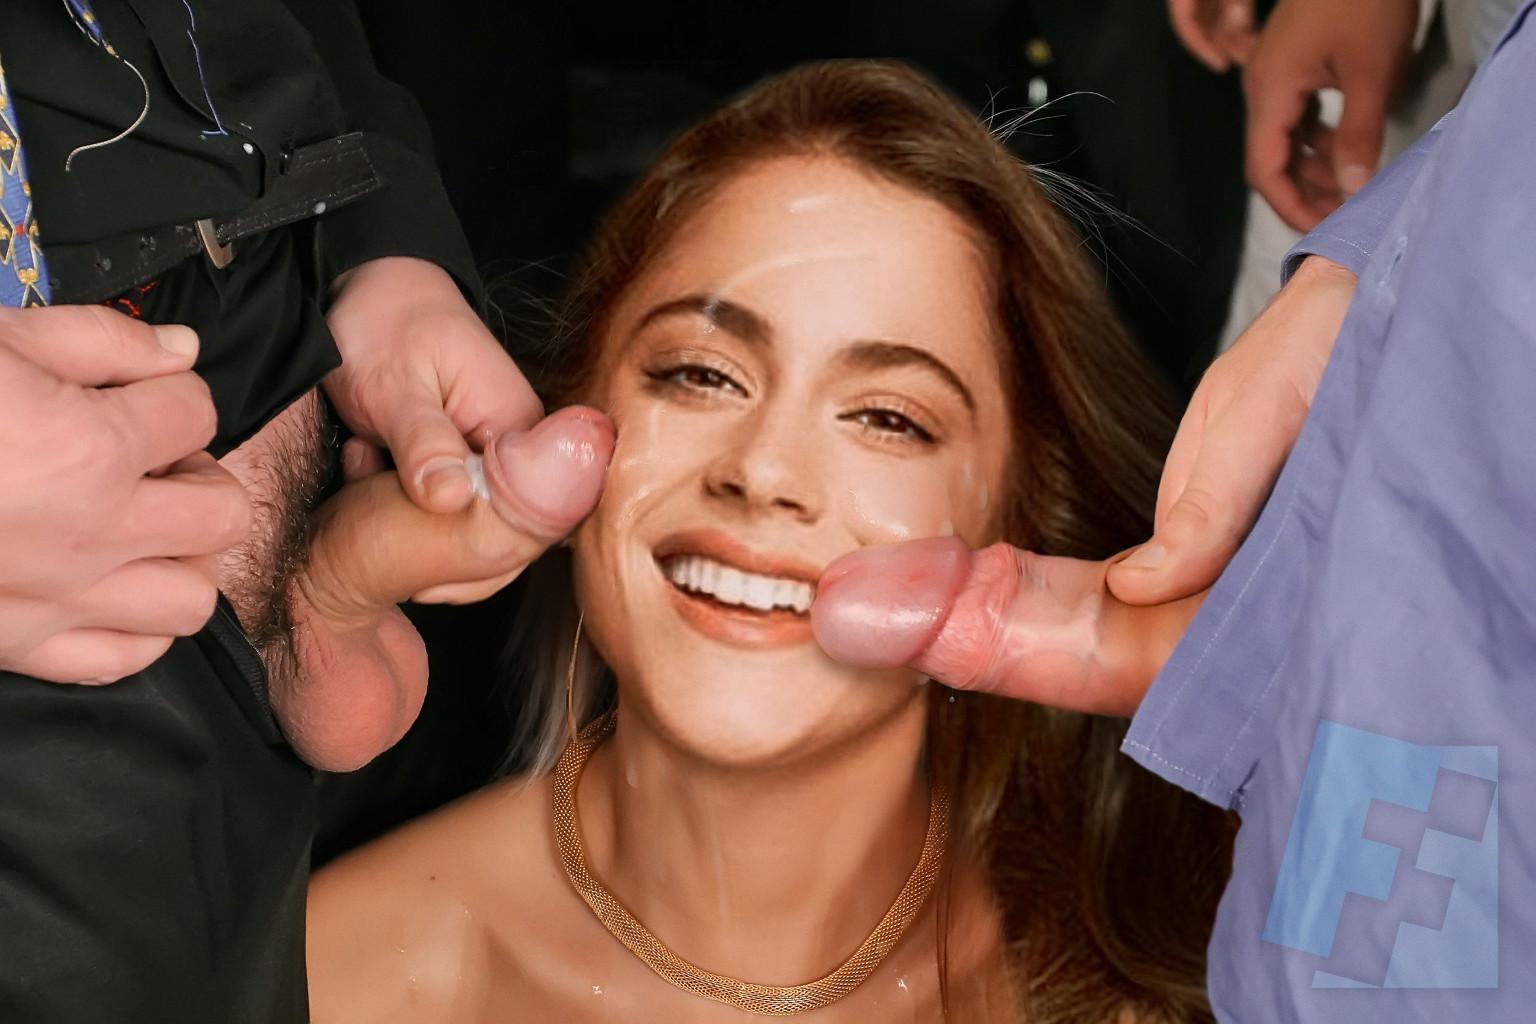 Martina stoessel nackt porno